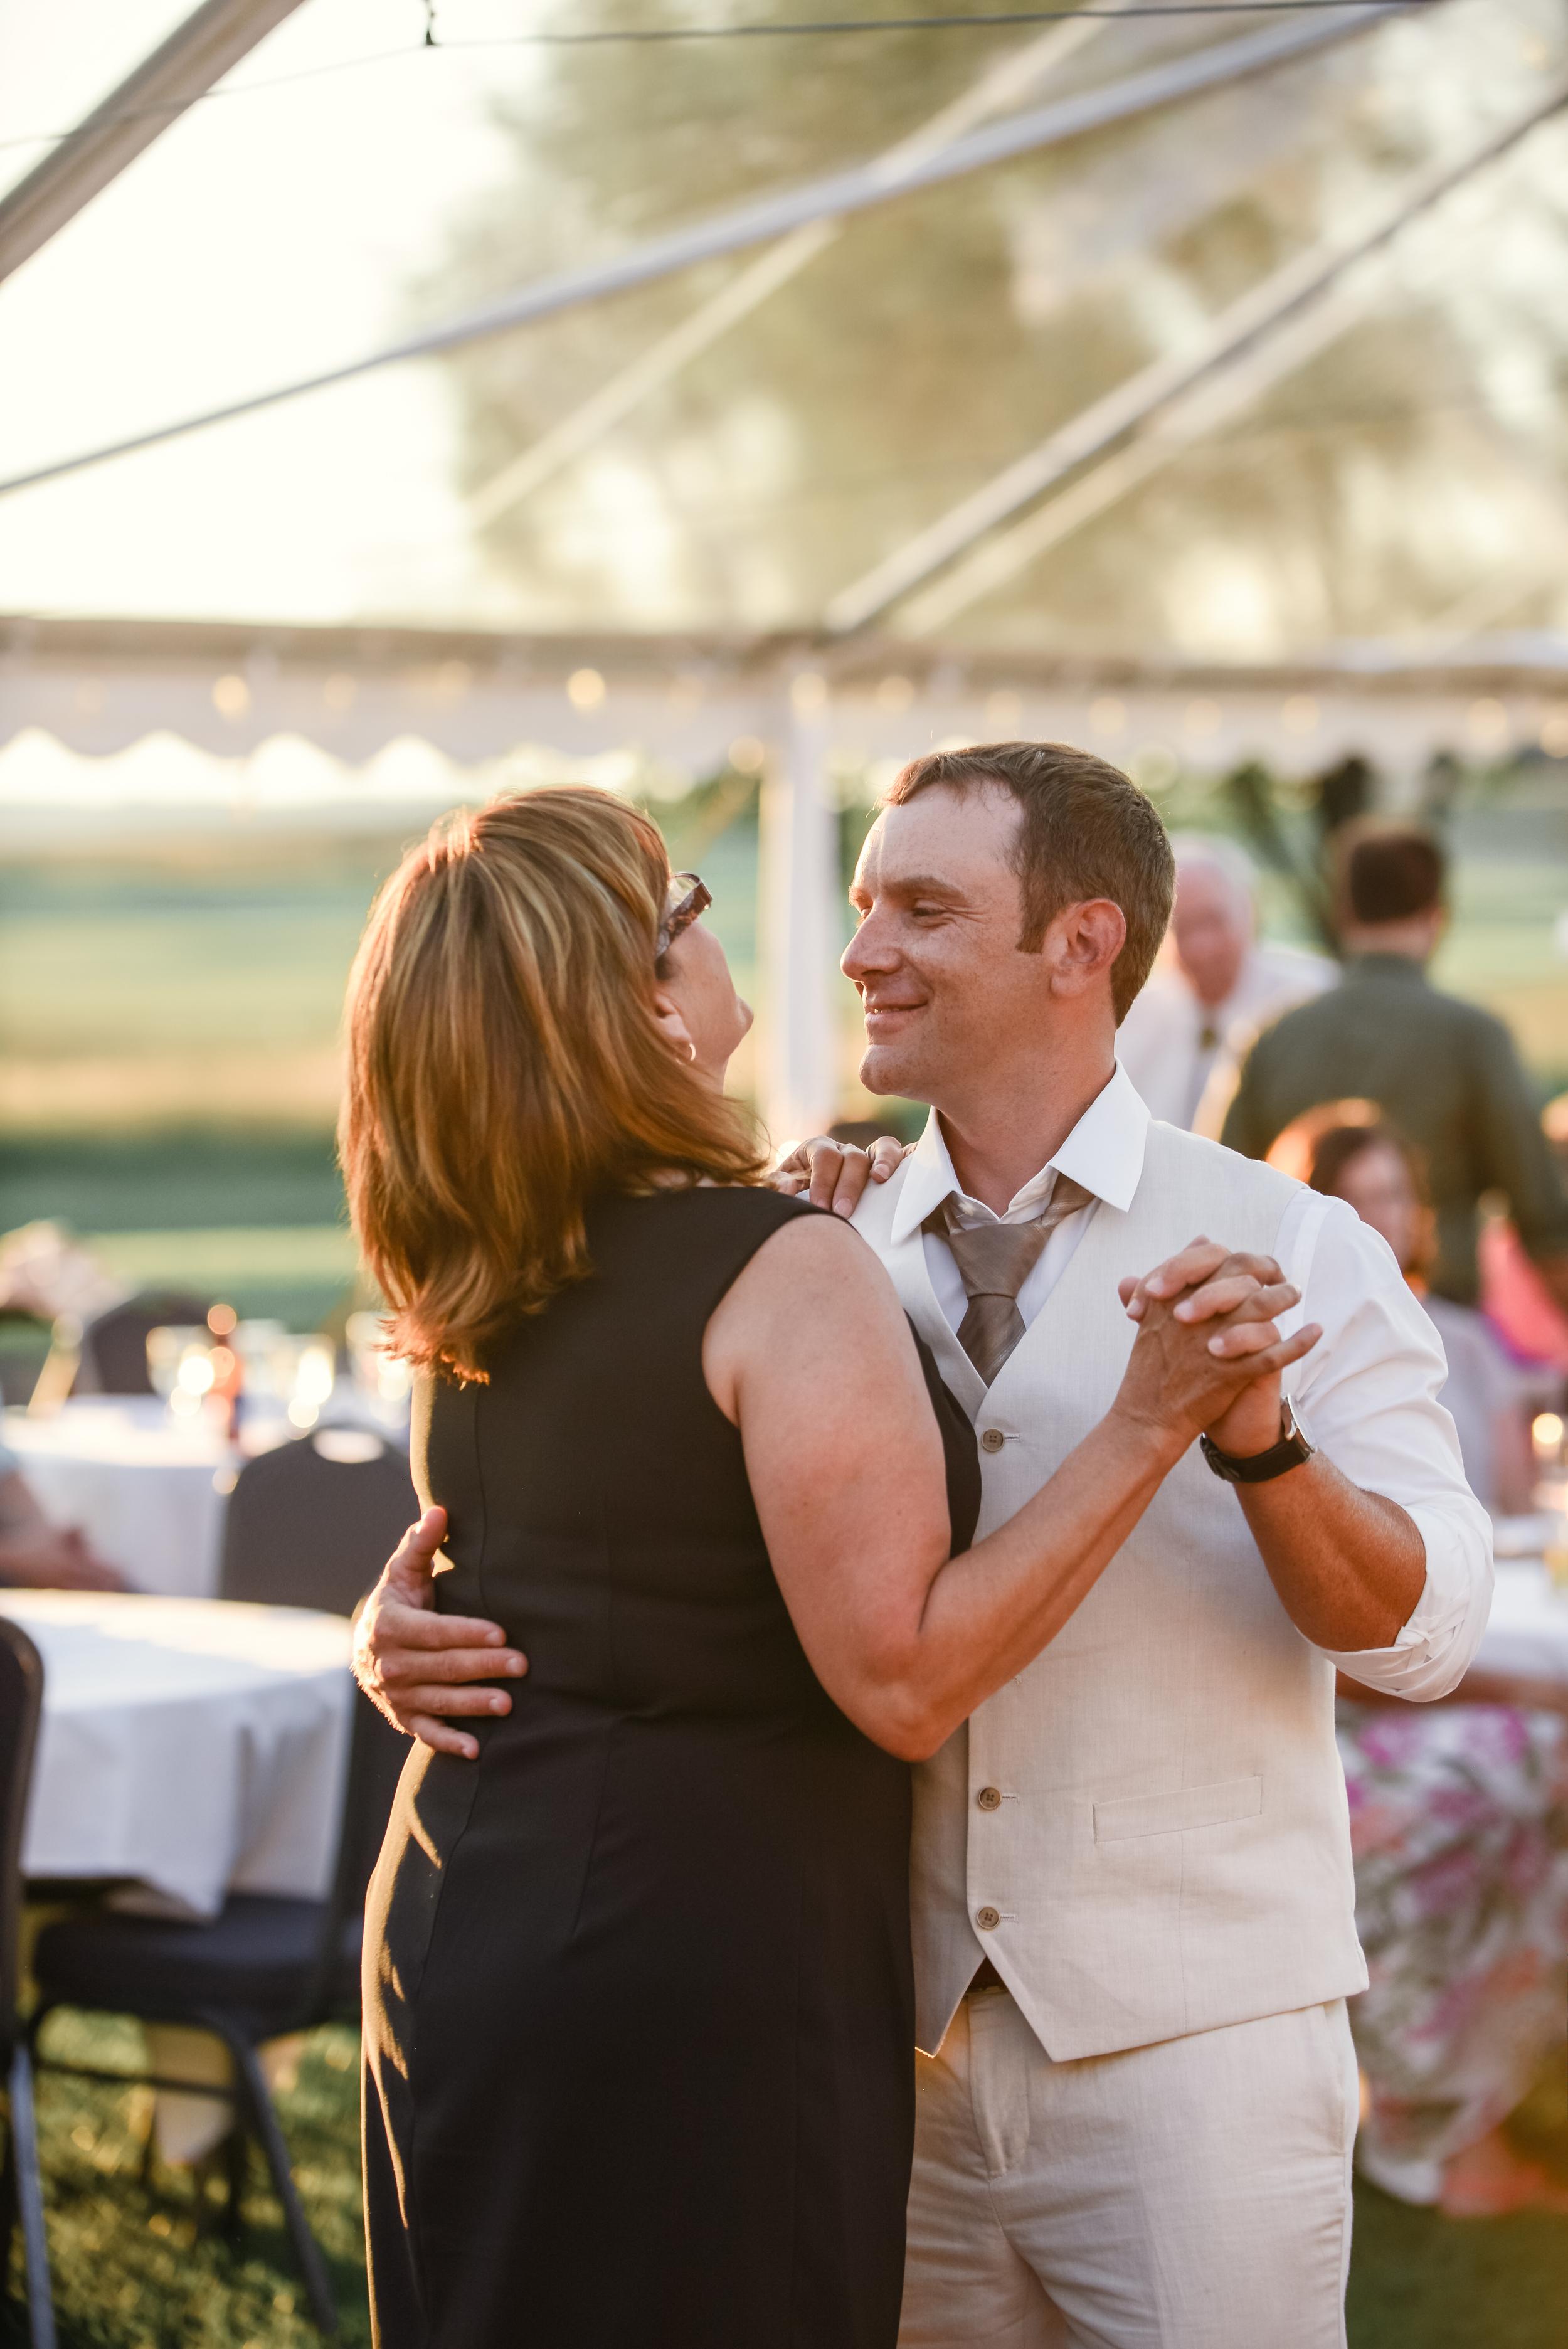 Traverse City Wedding Photography, Michigan Wedding Photographers